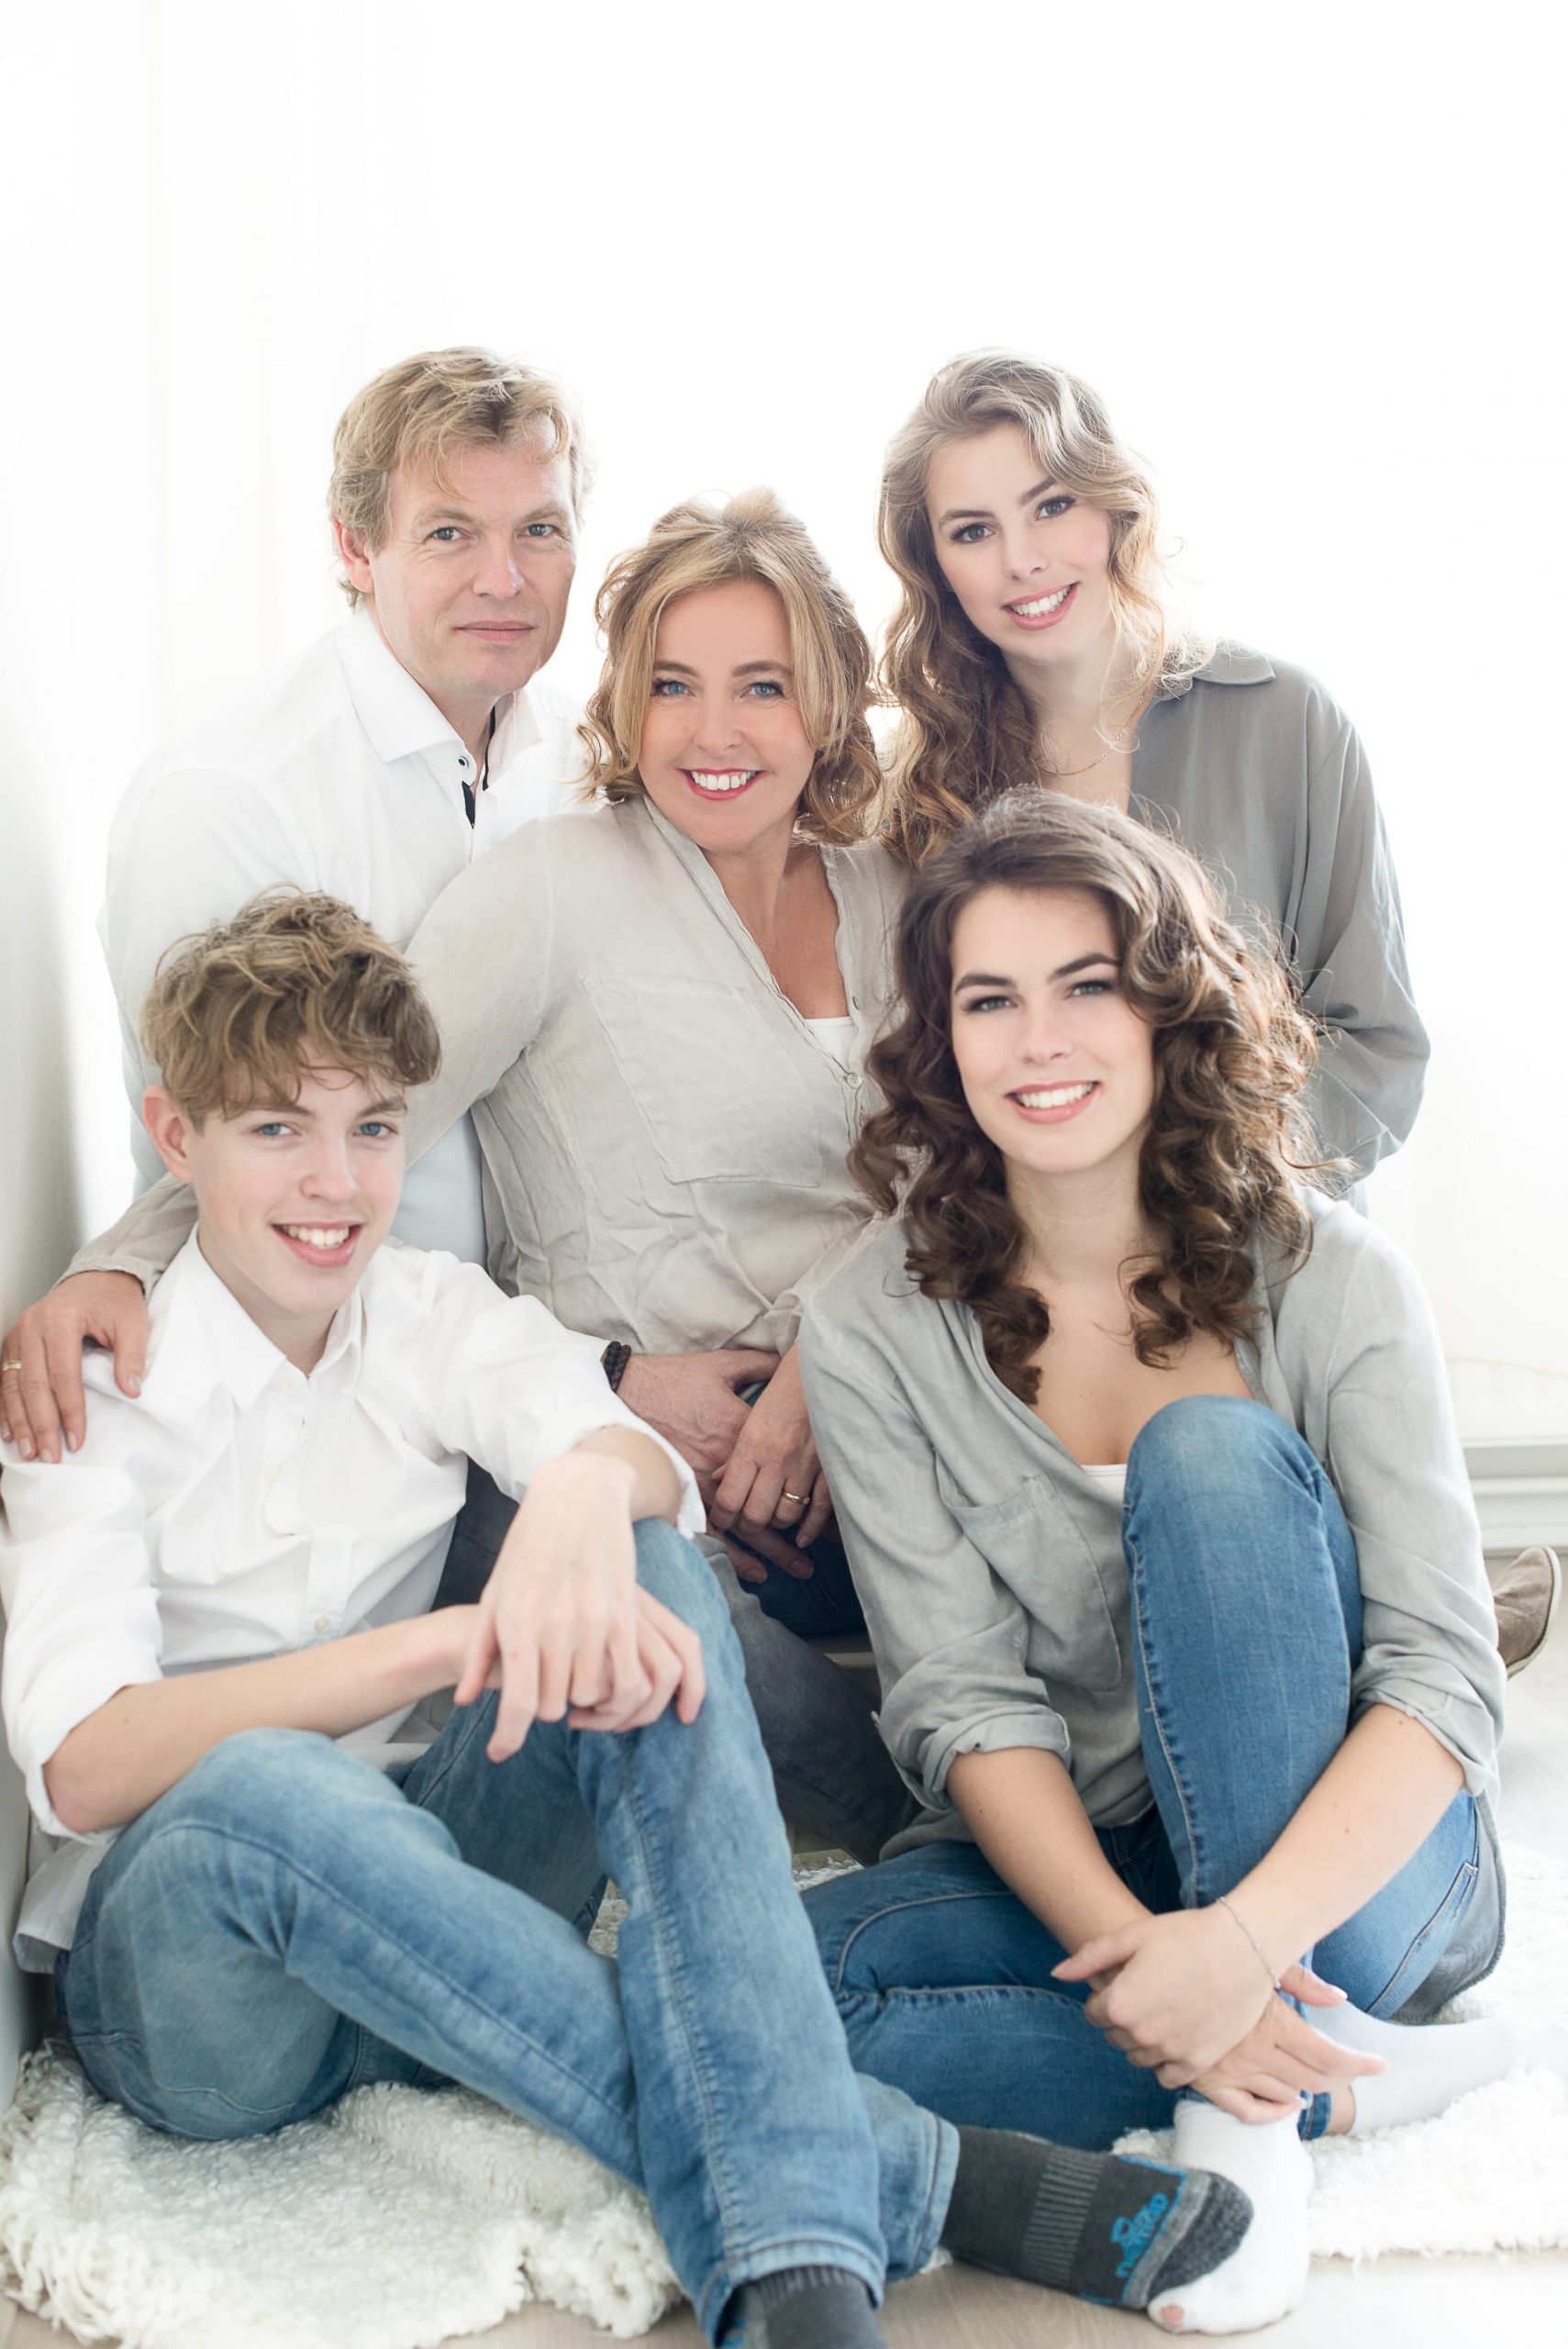 Family Portraits familie fotoshoot